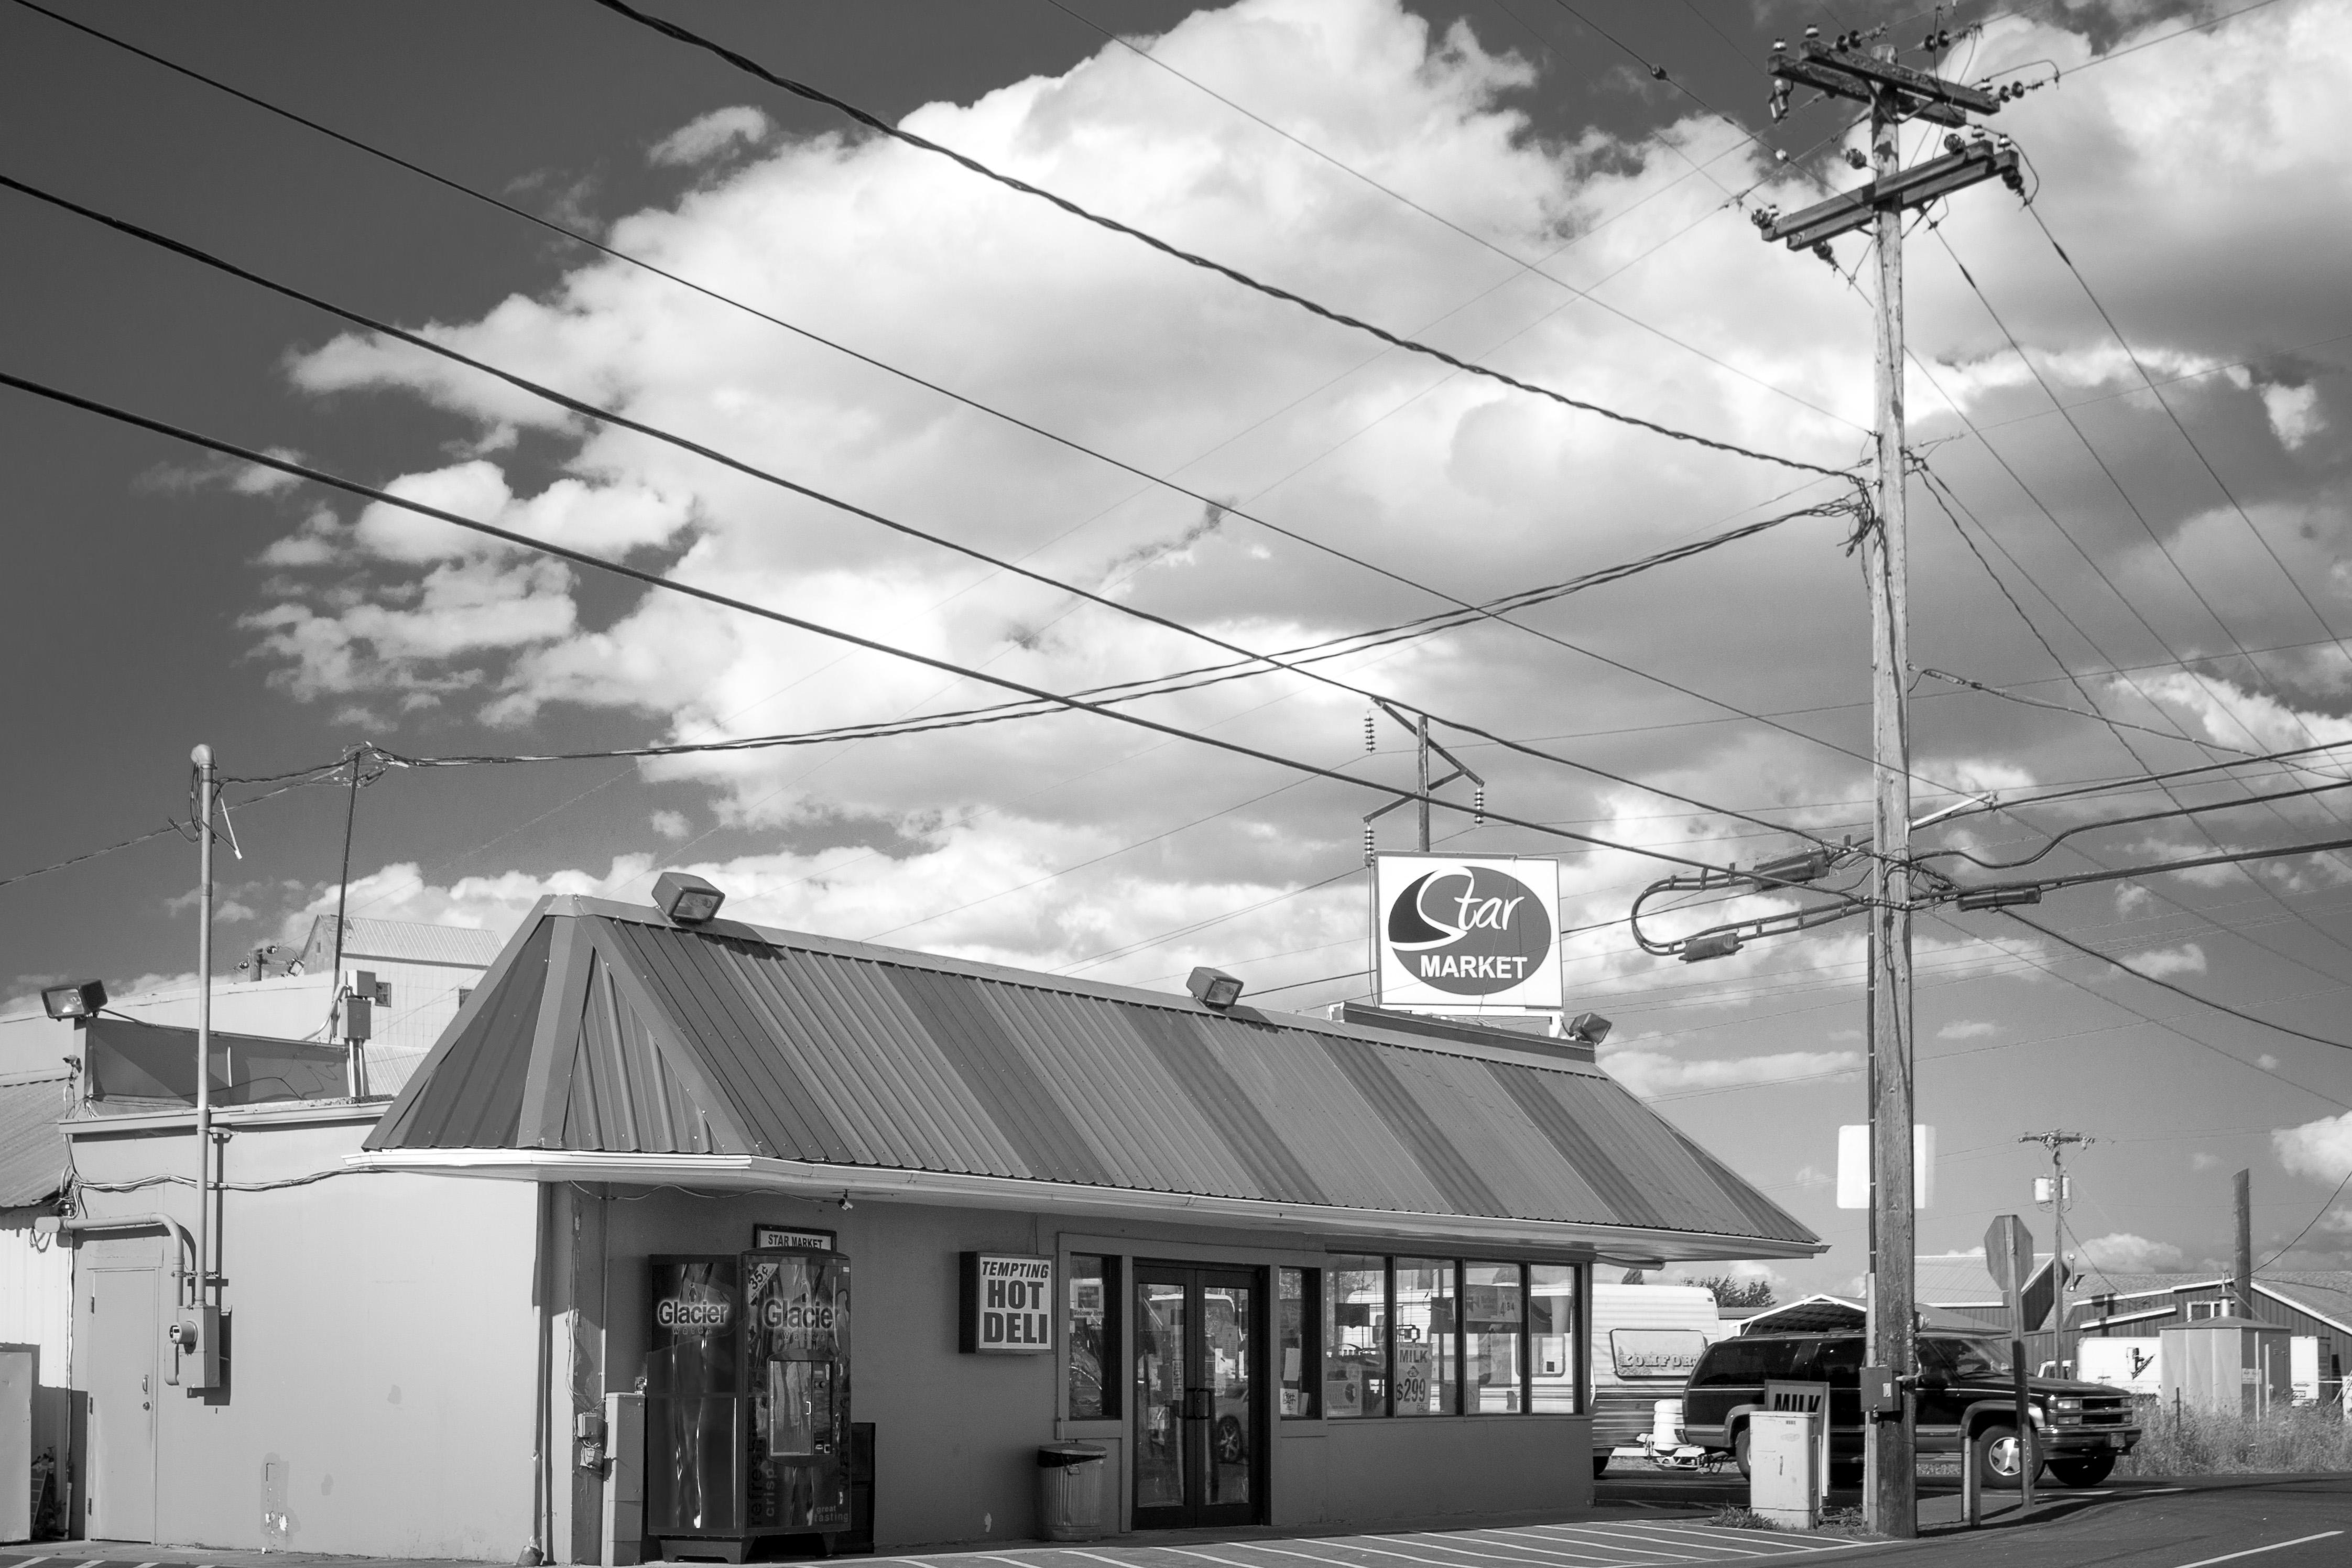 File:Star Market (Brooks, Oregon) jpg - Wikimedia Commons